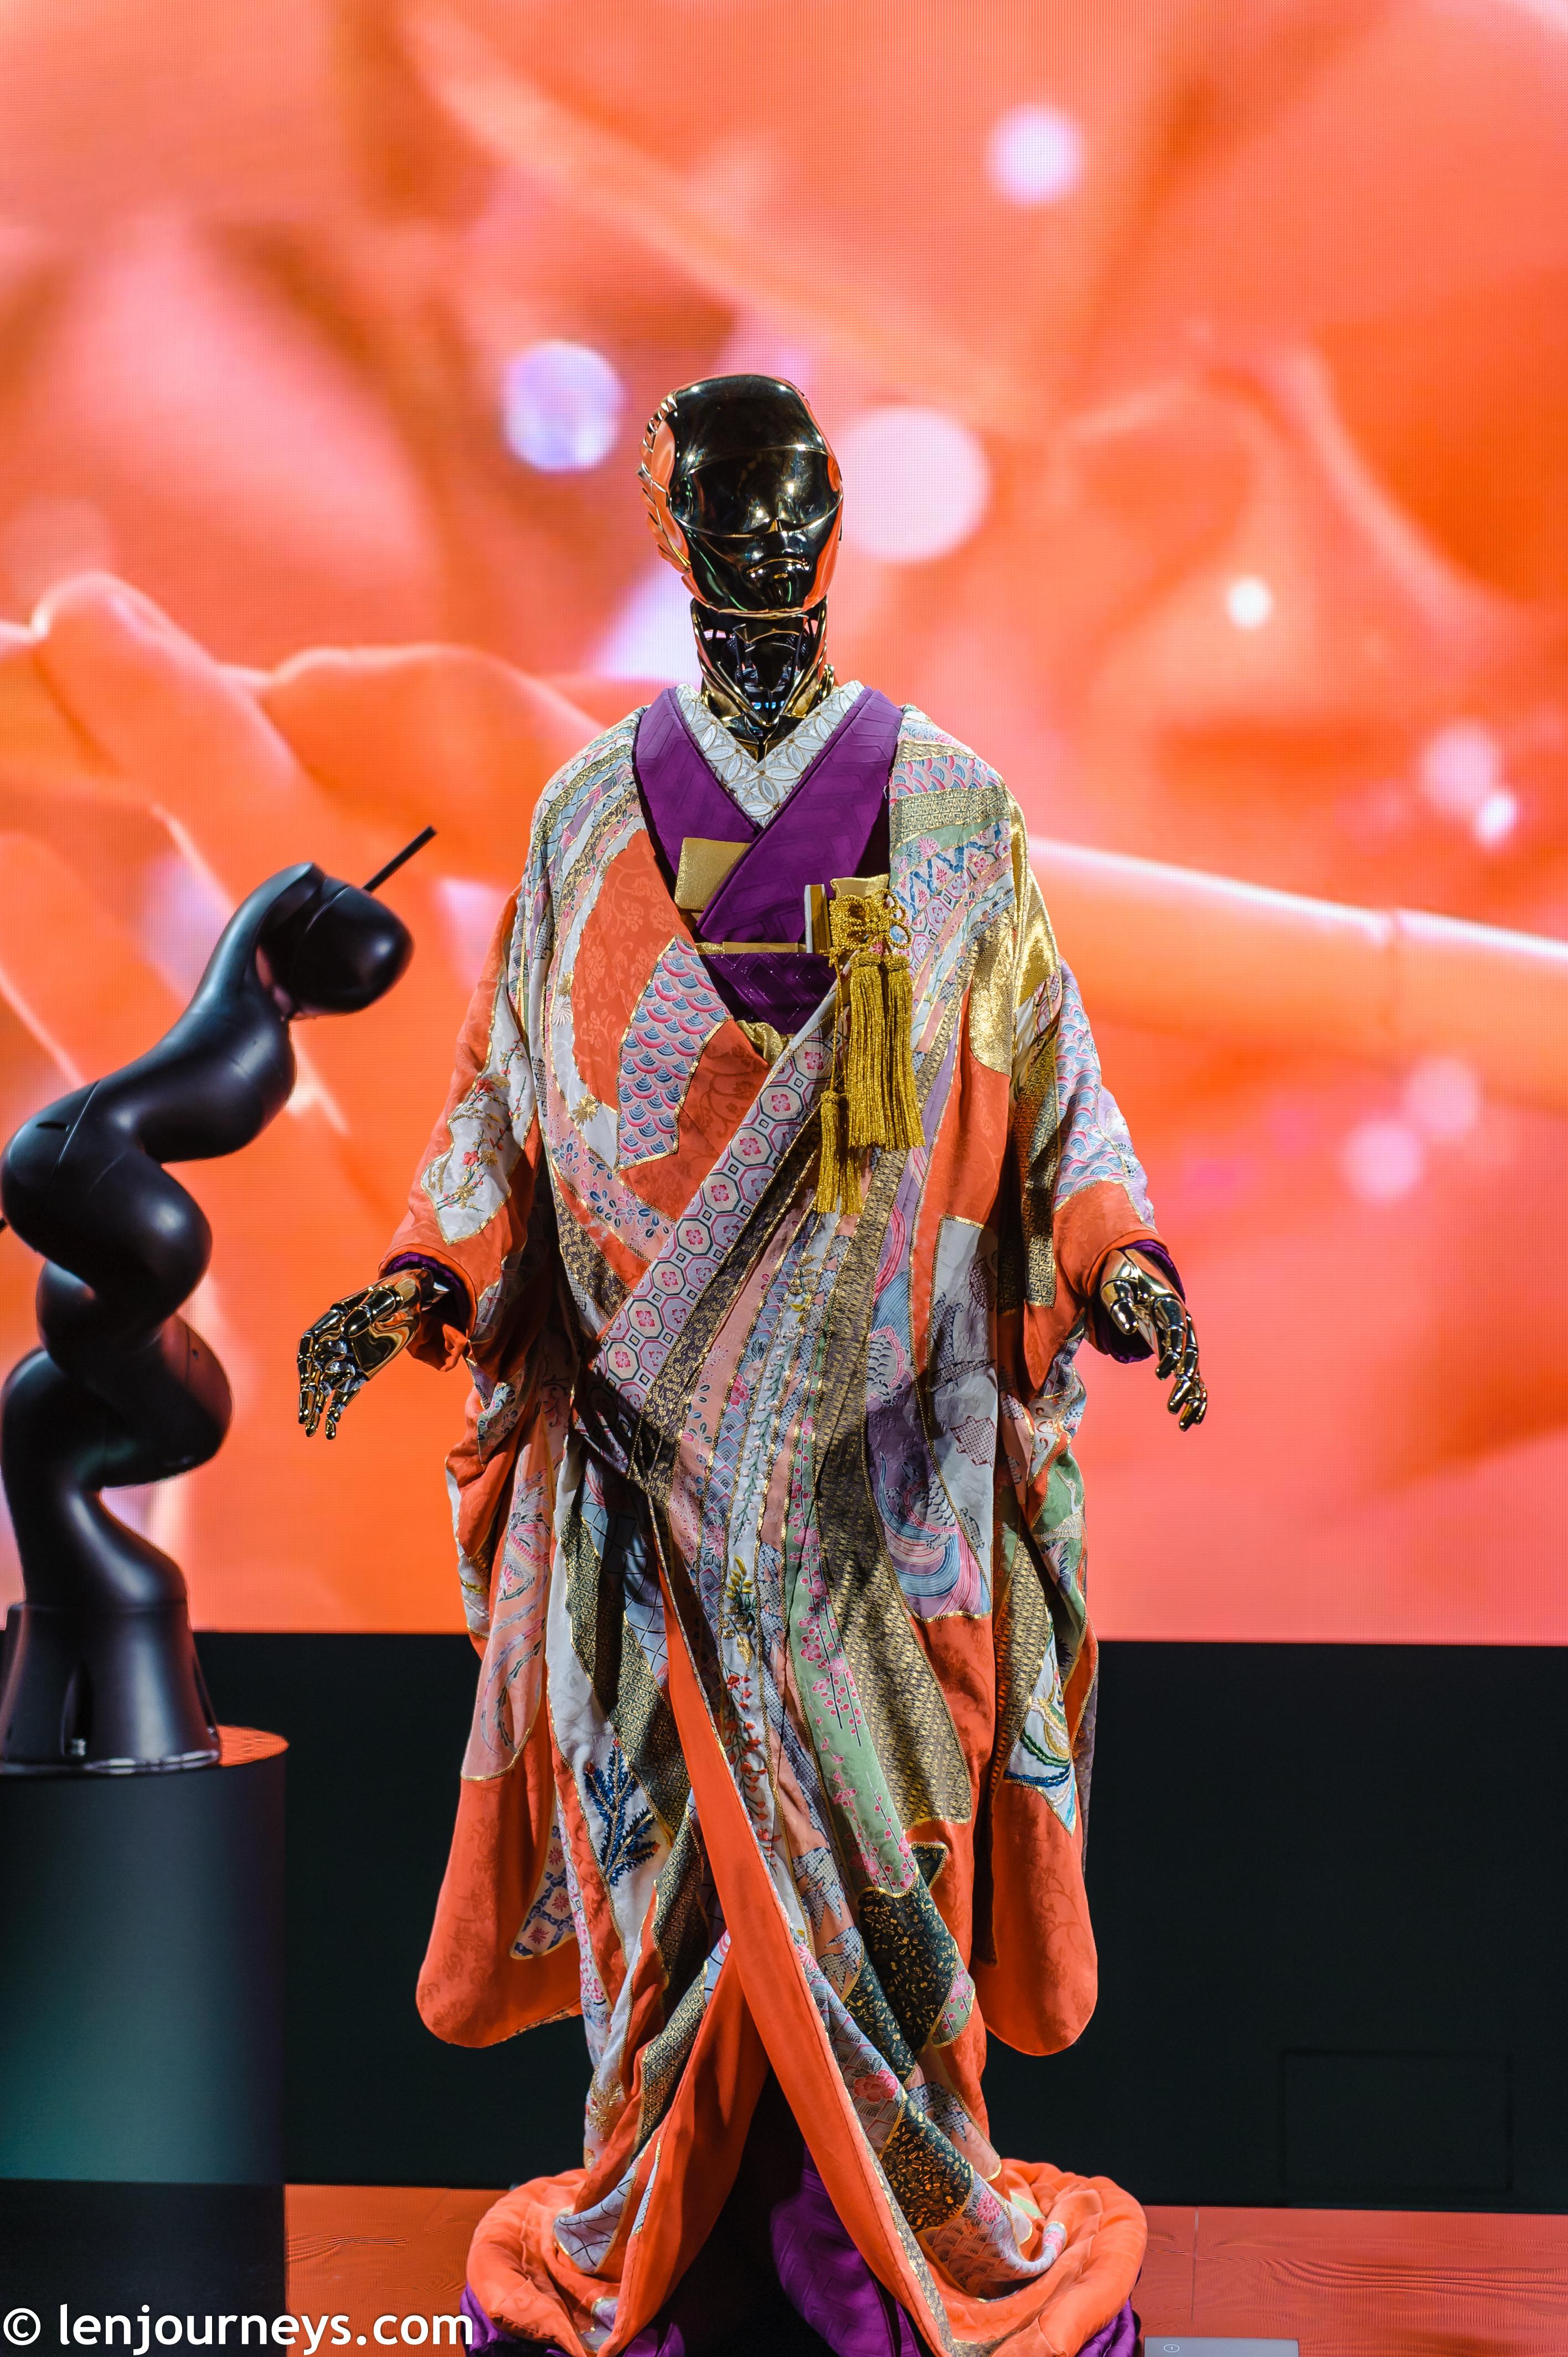 Robot wearing kimono